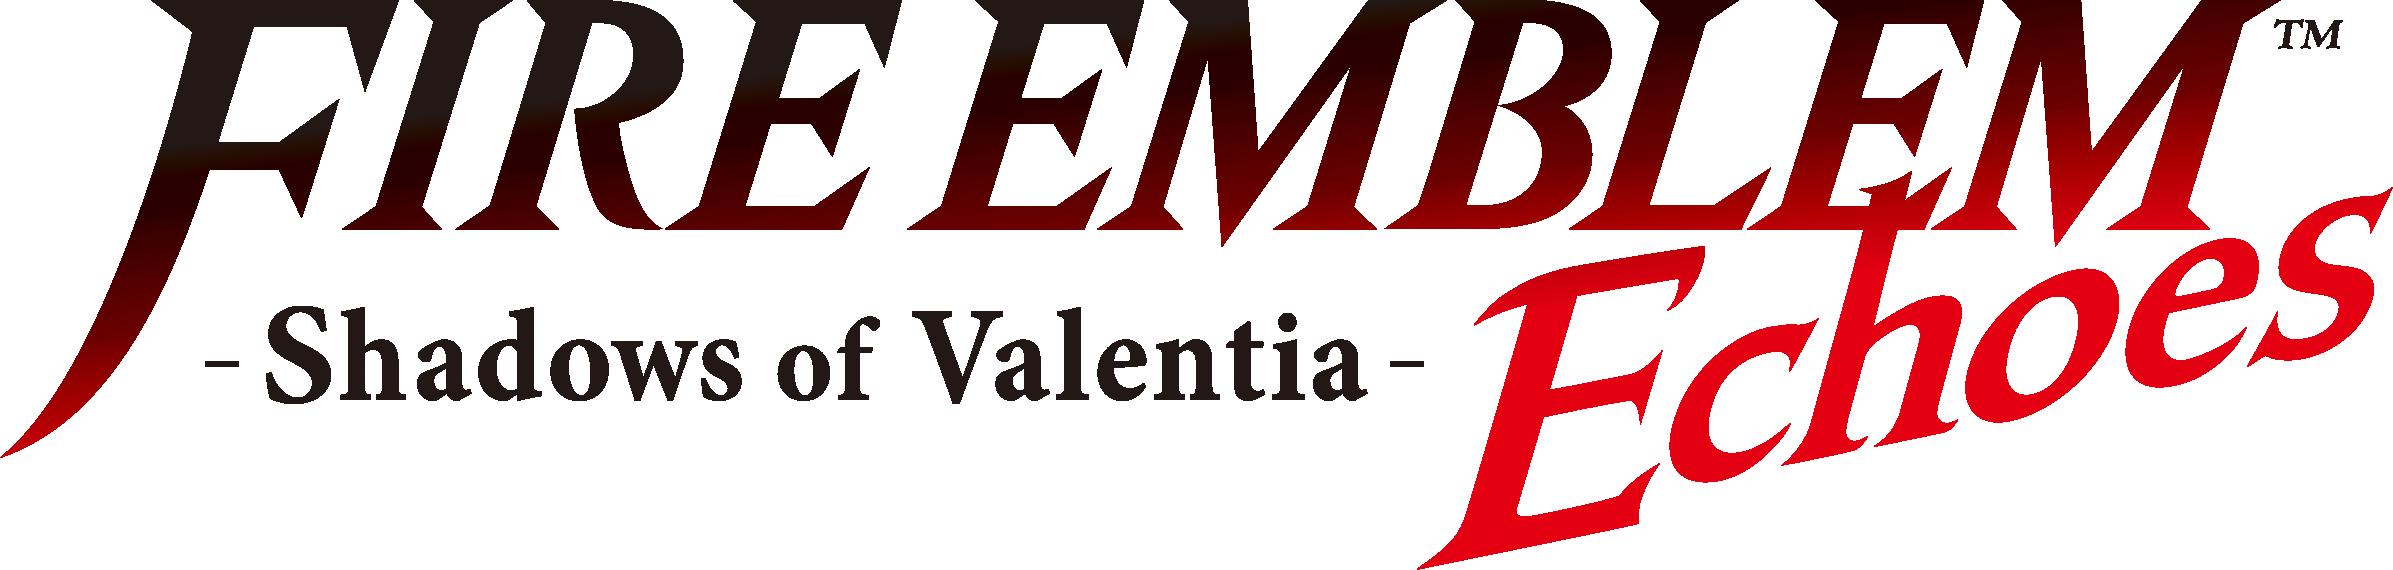 Fire emblem series fire emblem wiki fandom powered by wikia fire emblem echoes shadows of valentia biocorpaavc Choice Image